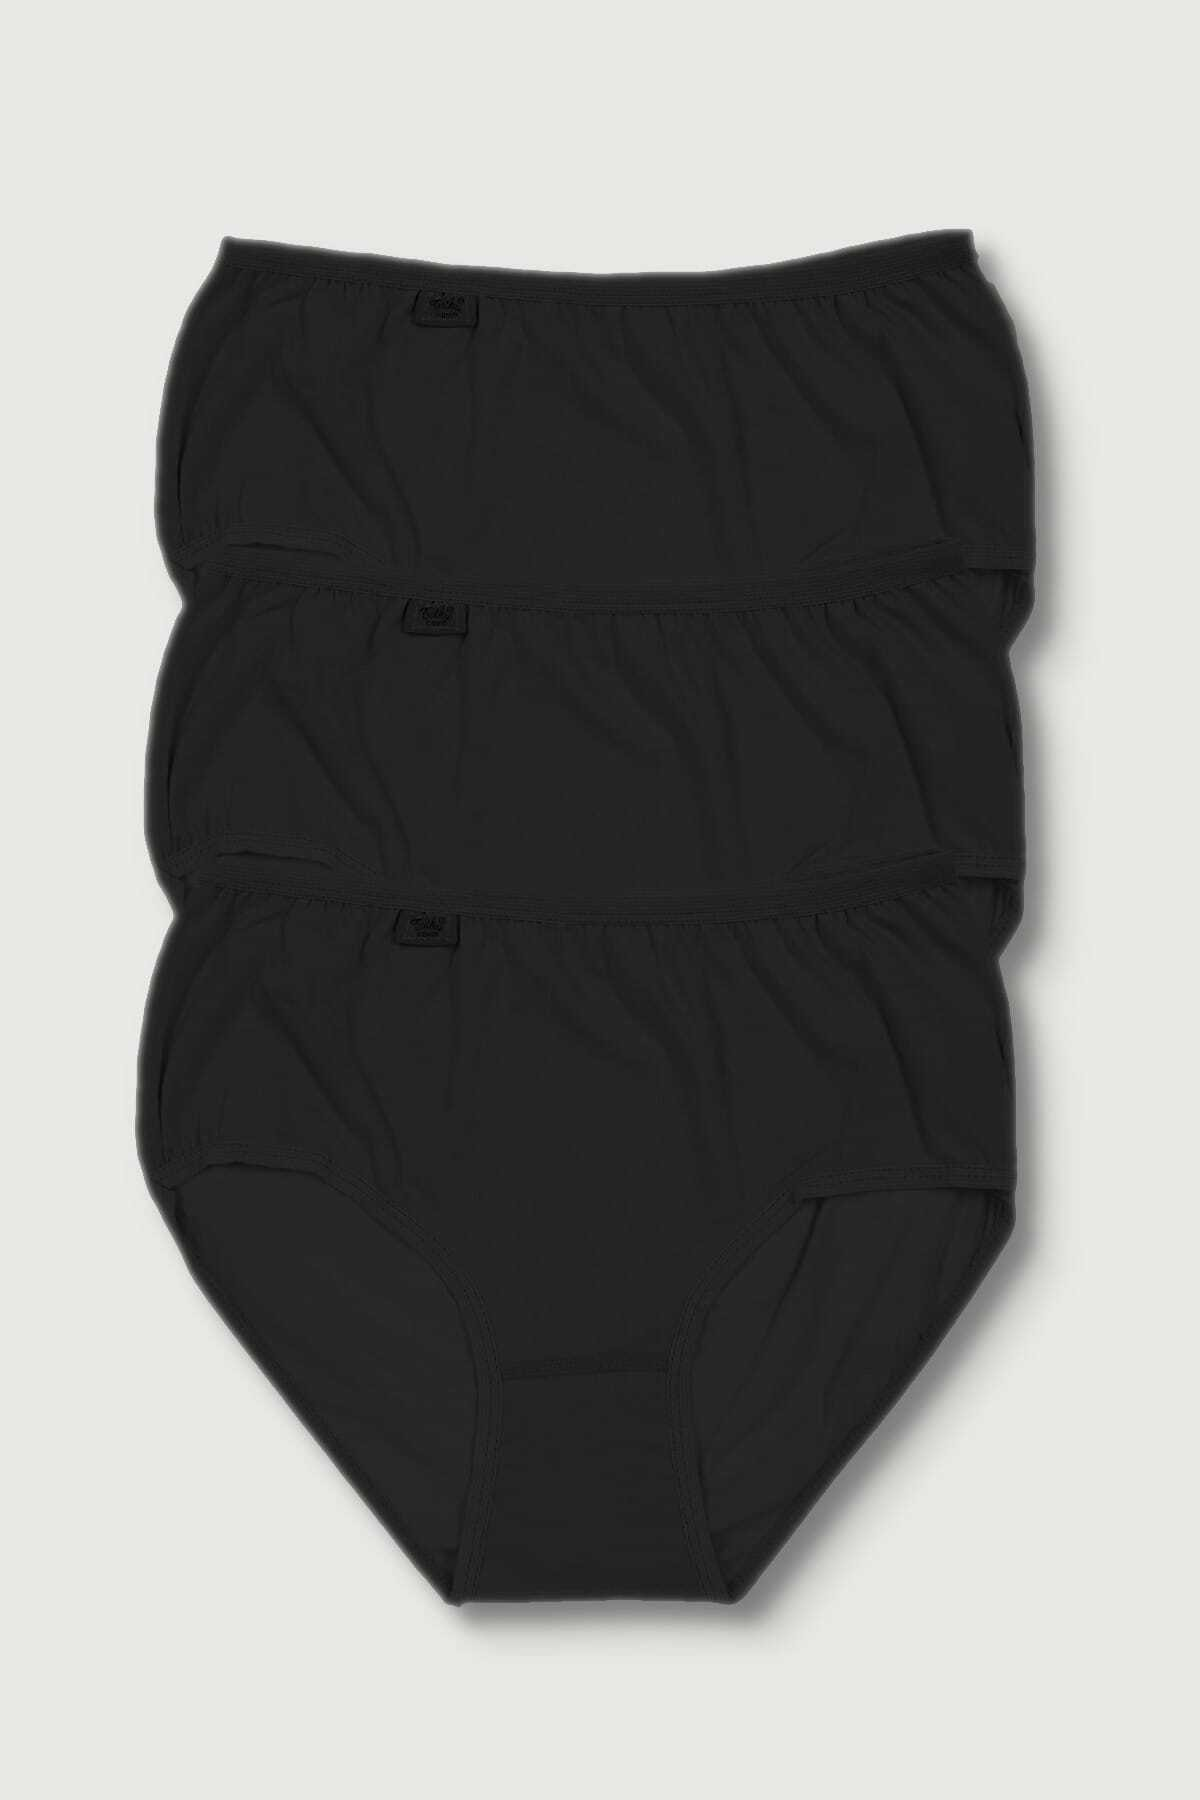 Tutku Kadın Siyah Bato Külot 3lü Paket 1